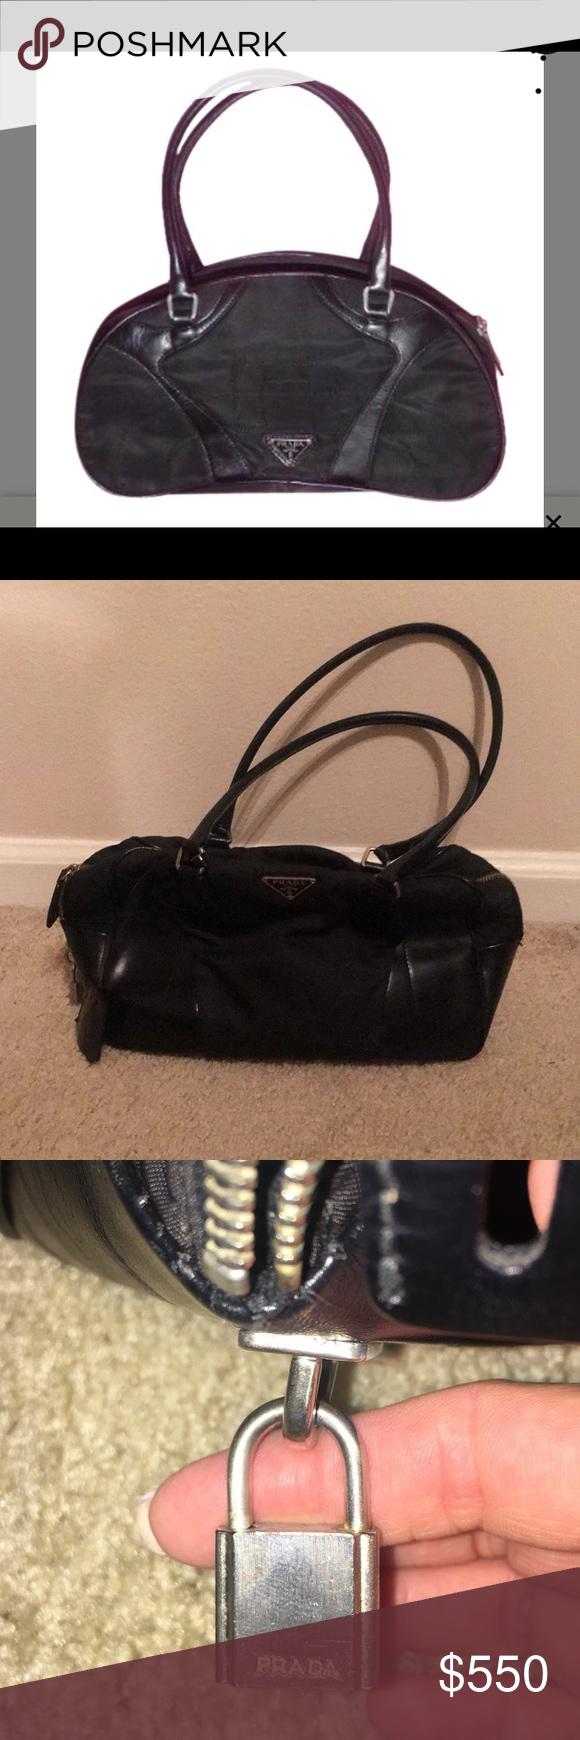 Photo of Prada handbag vintage, collectors item For sale is a vintage, designer- Prada, b…